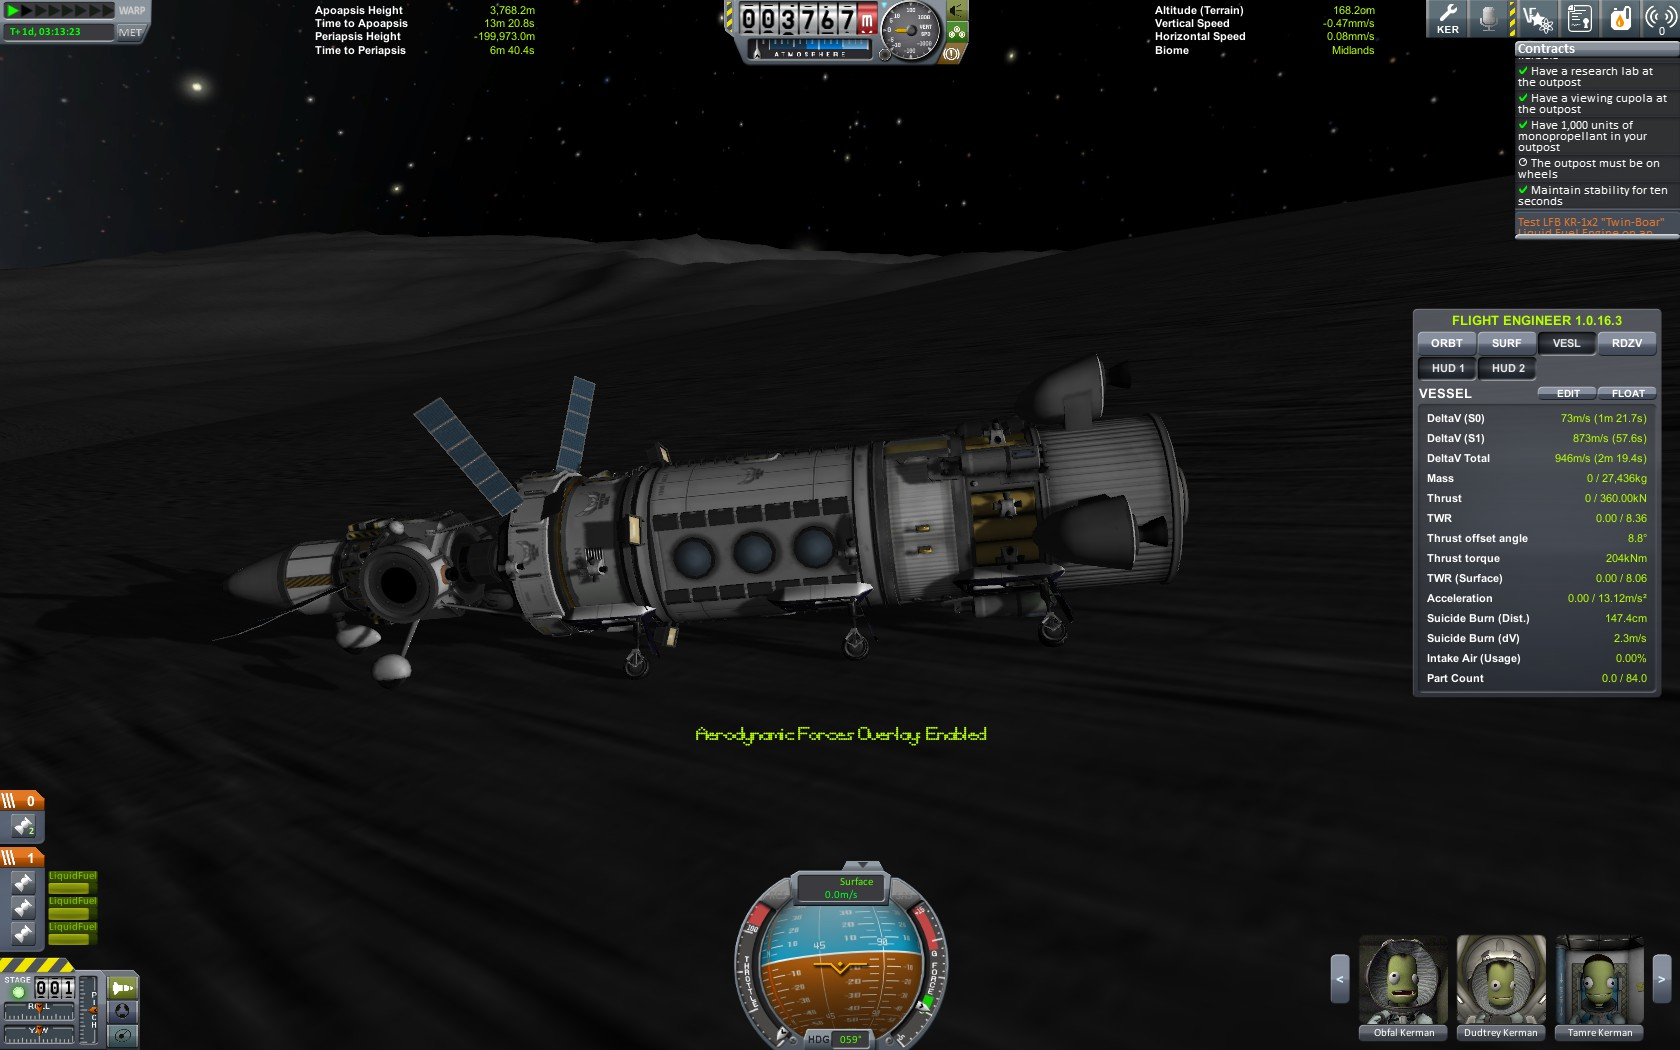 kerbal space program bugs - photo #35